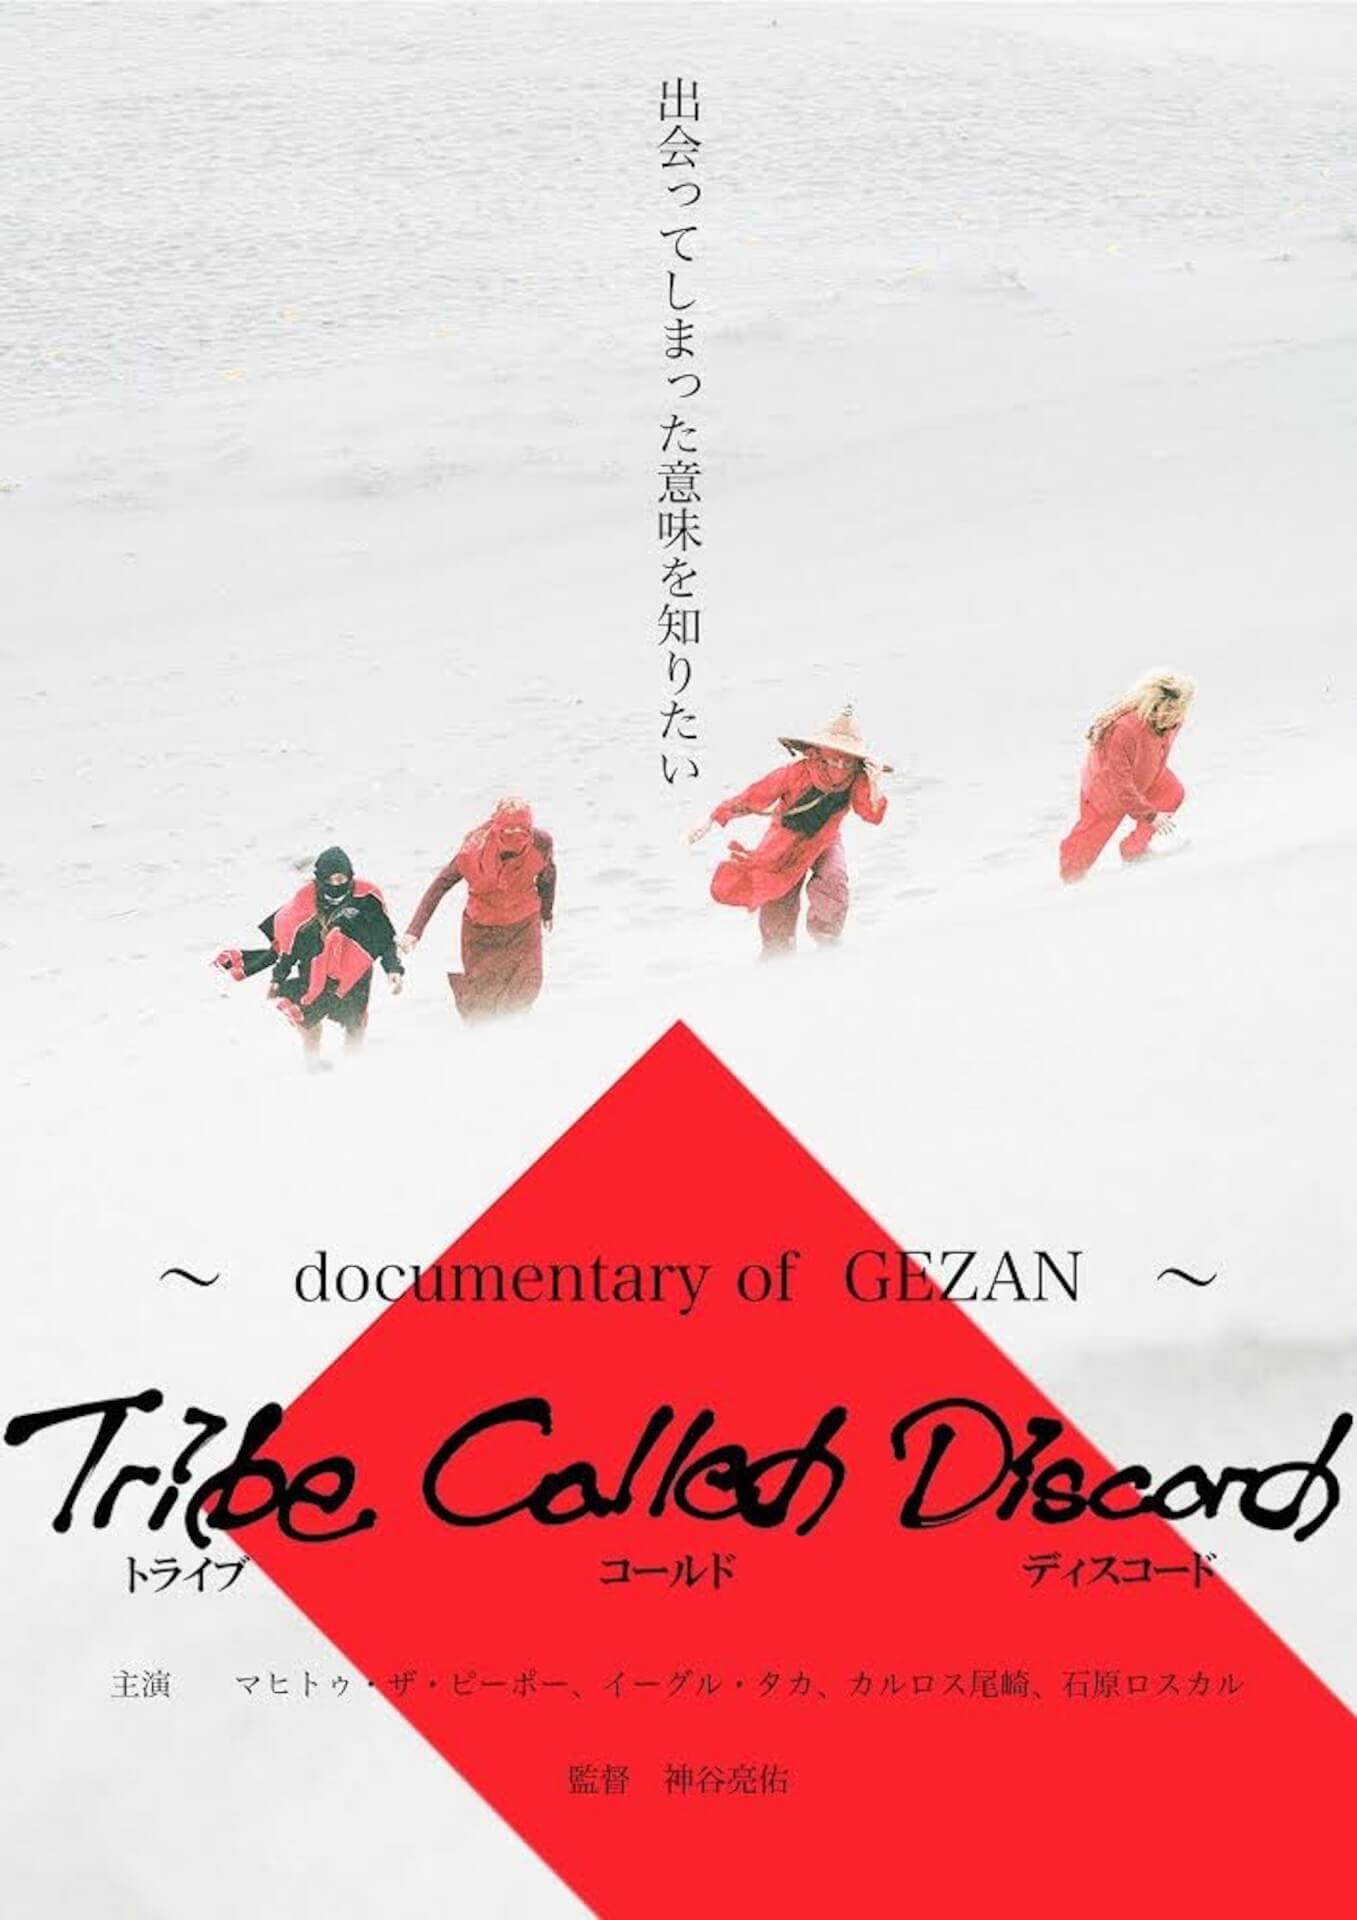 GEZAN初のドキュメンタリー映画『Tribe Called Discord:Documentary of GEZAN』DVD発売&配信決定 music200205_-gezandocumentarydvd_2